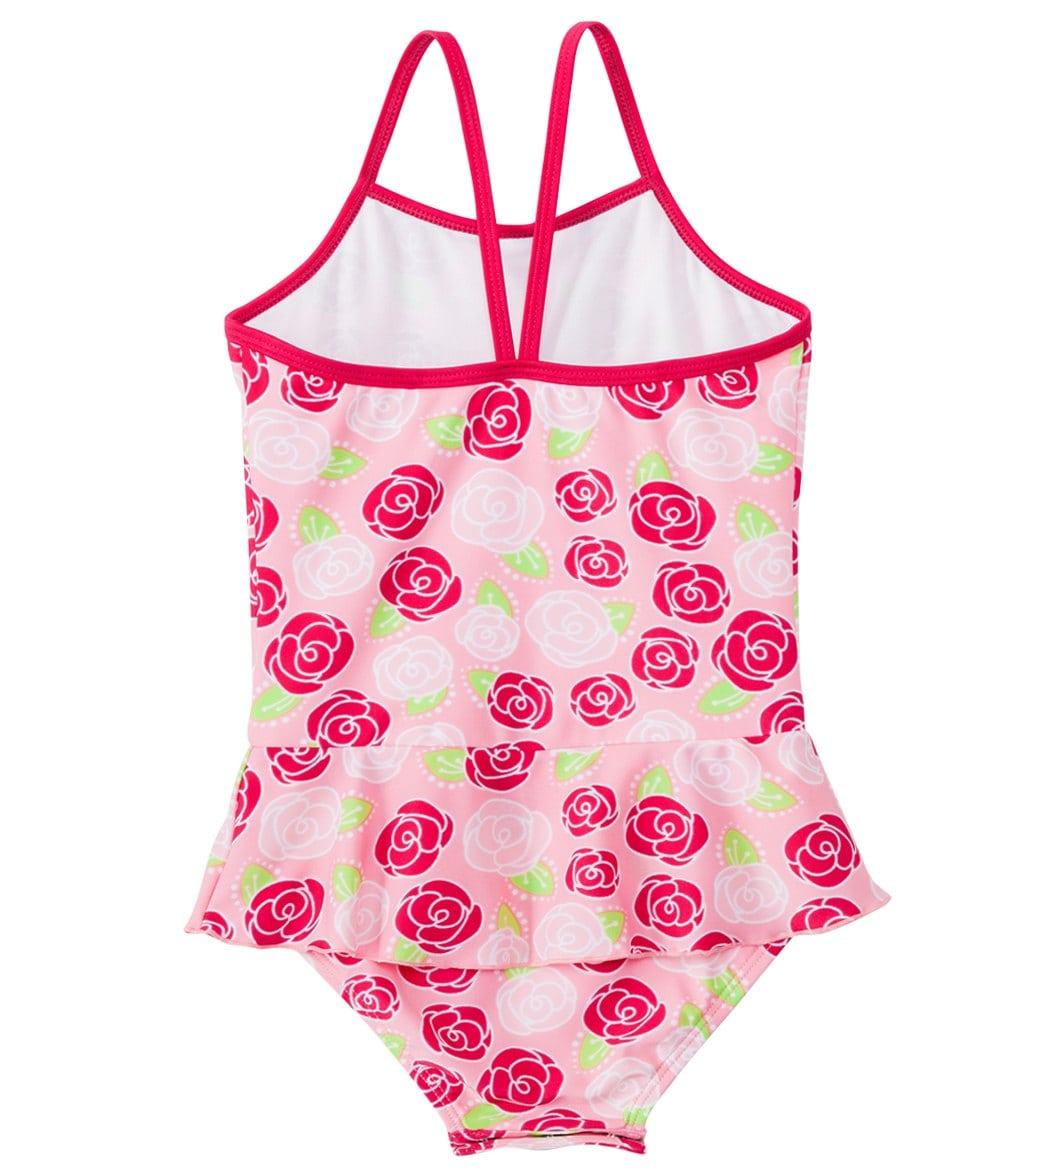 2a0ab4b29b975 SnapMe Girls' Rosalita Skirted Peplum One Piece Swimsuit UVP 50+ (6mos-8yrs